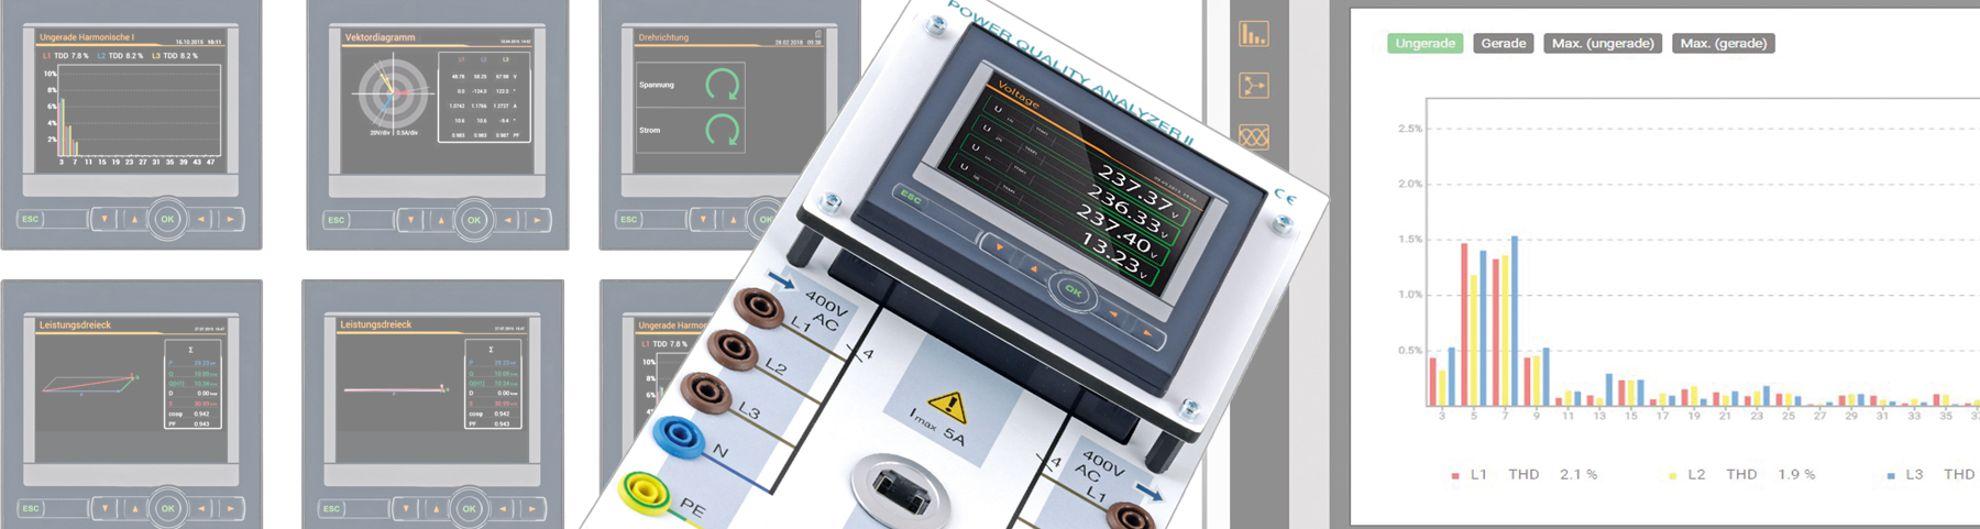 Energy Measurement Technology